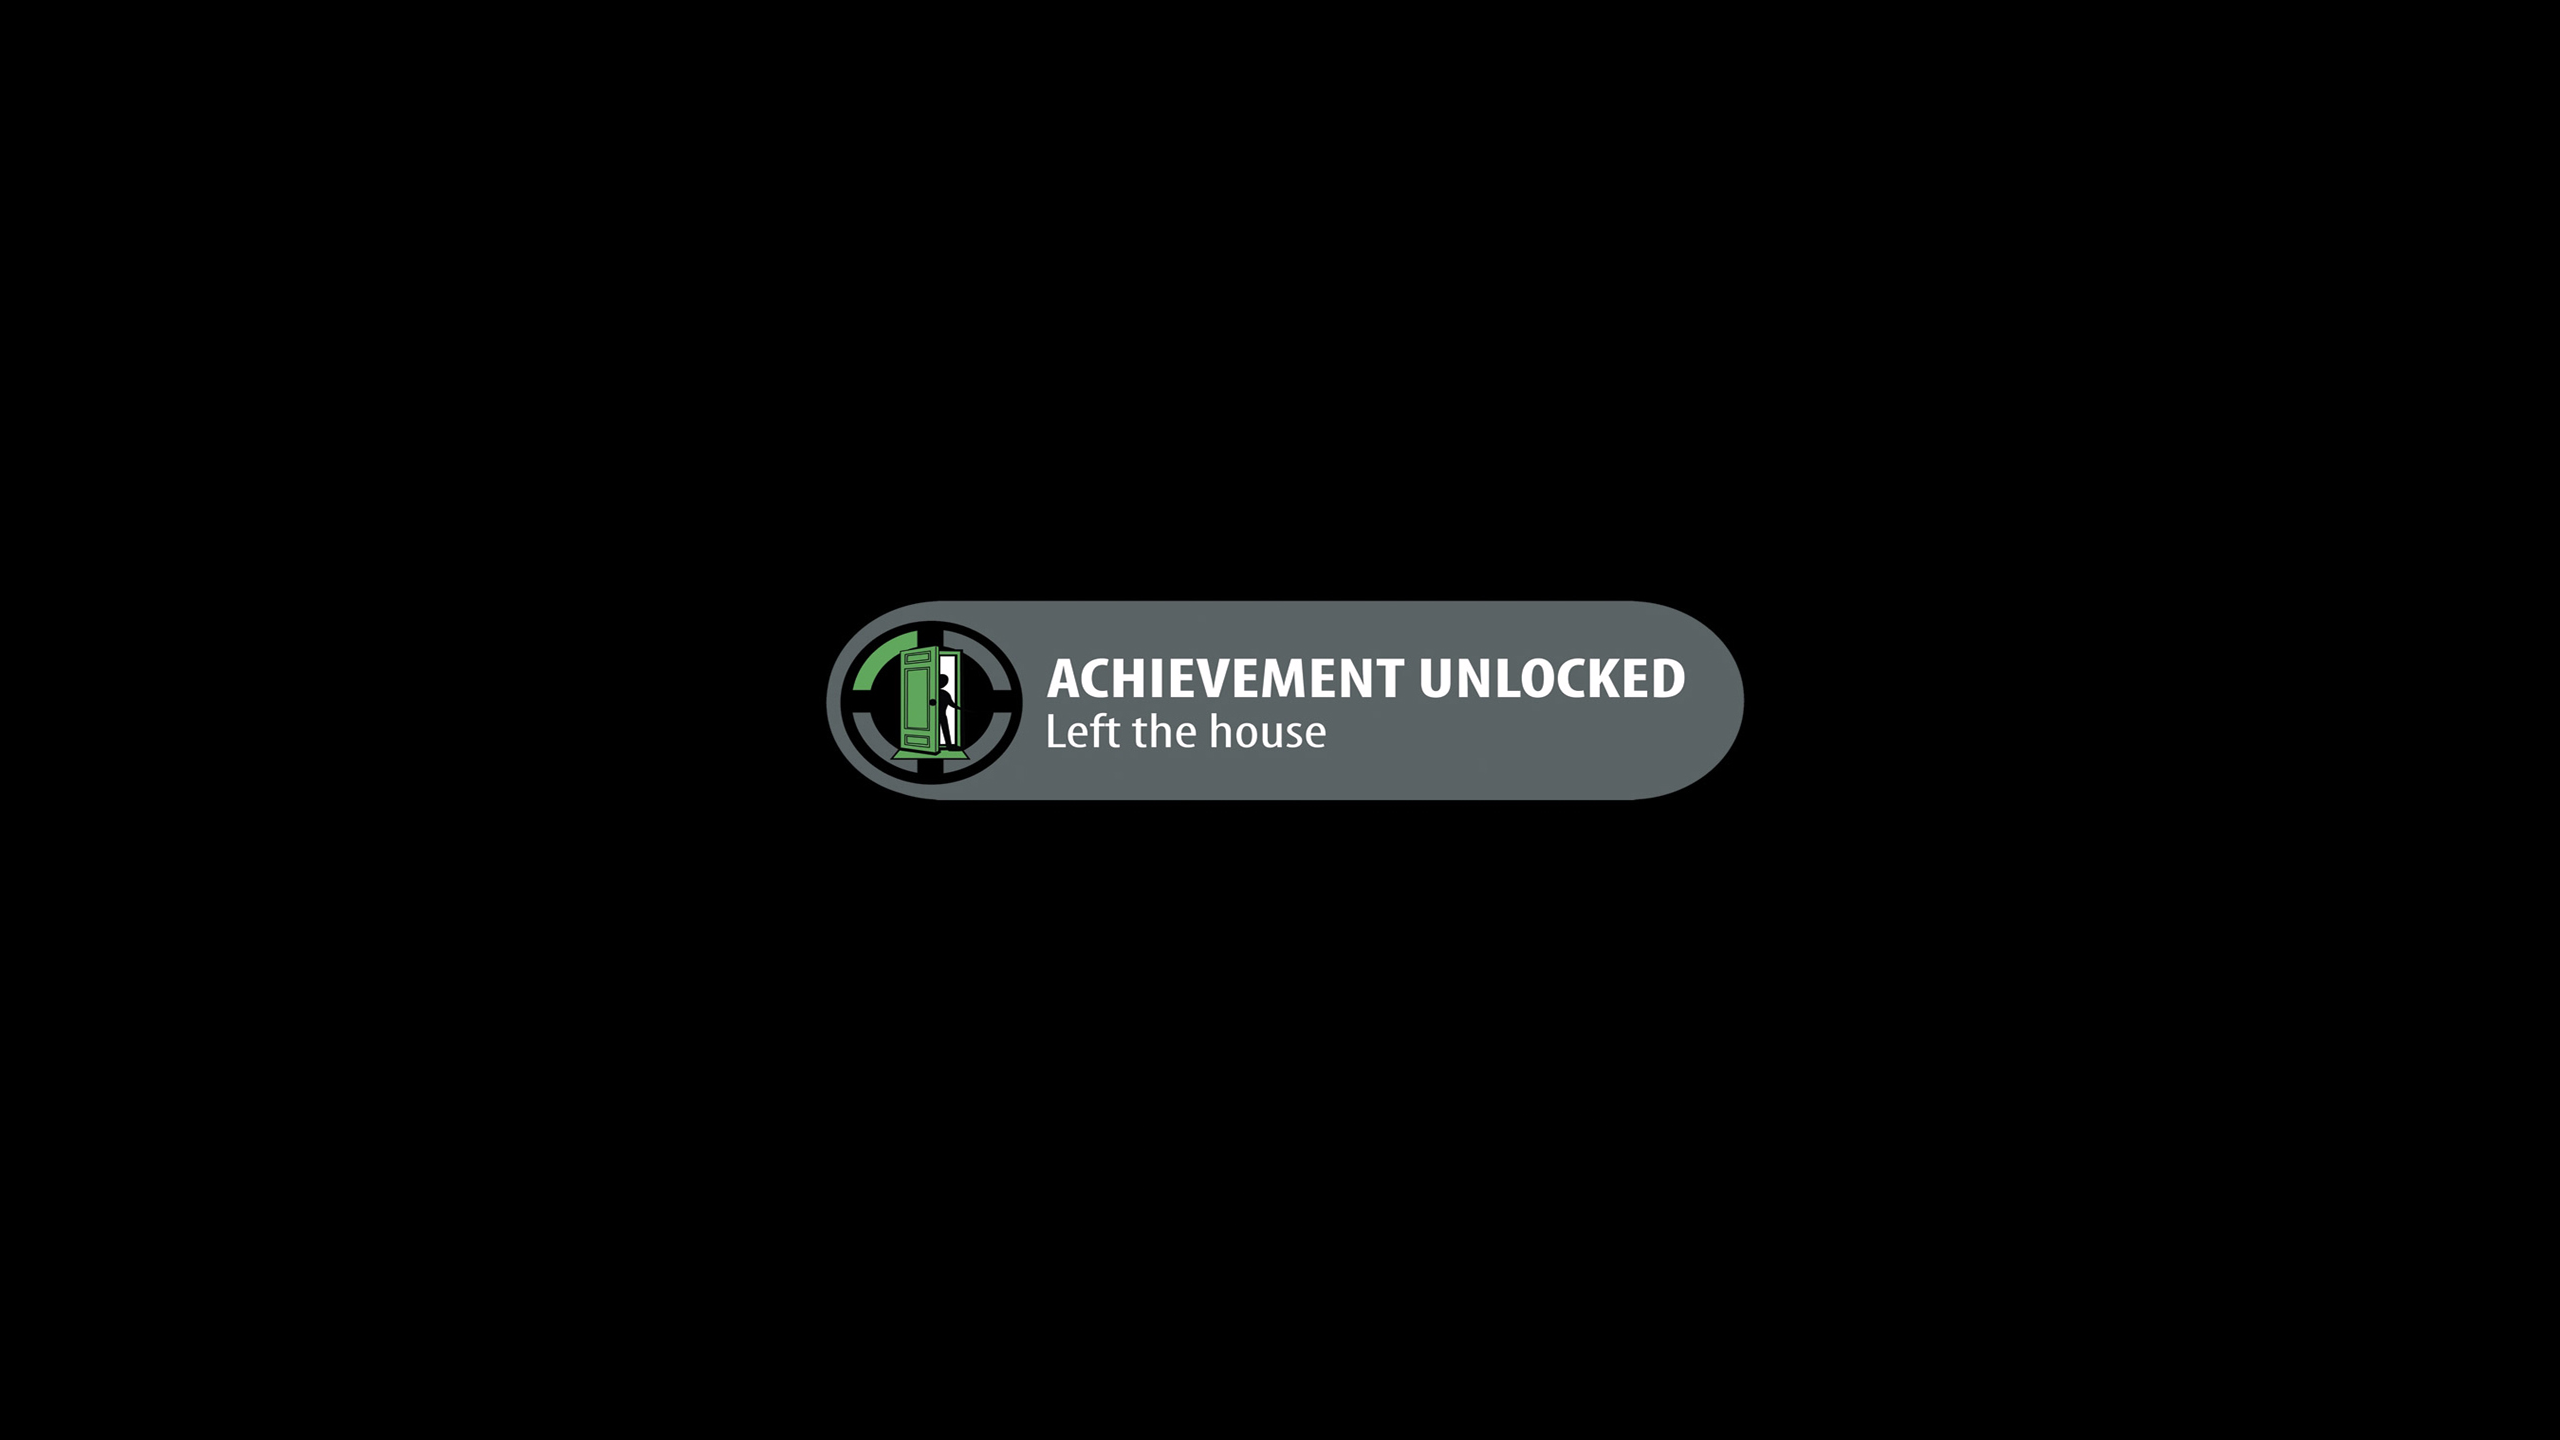 Download Achievements Xbox Wallpaper 2560x1440 Wallpoper 256641 2560x1440